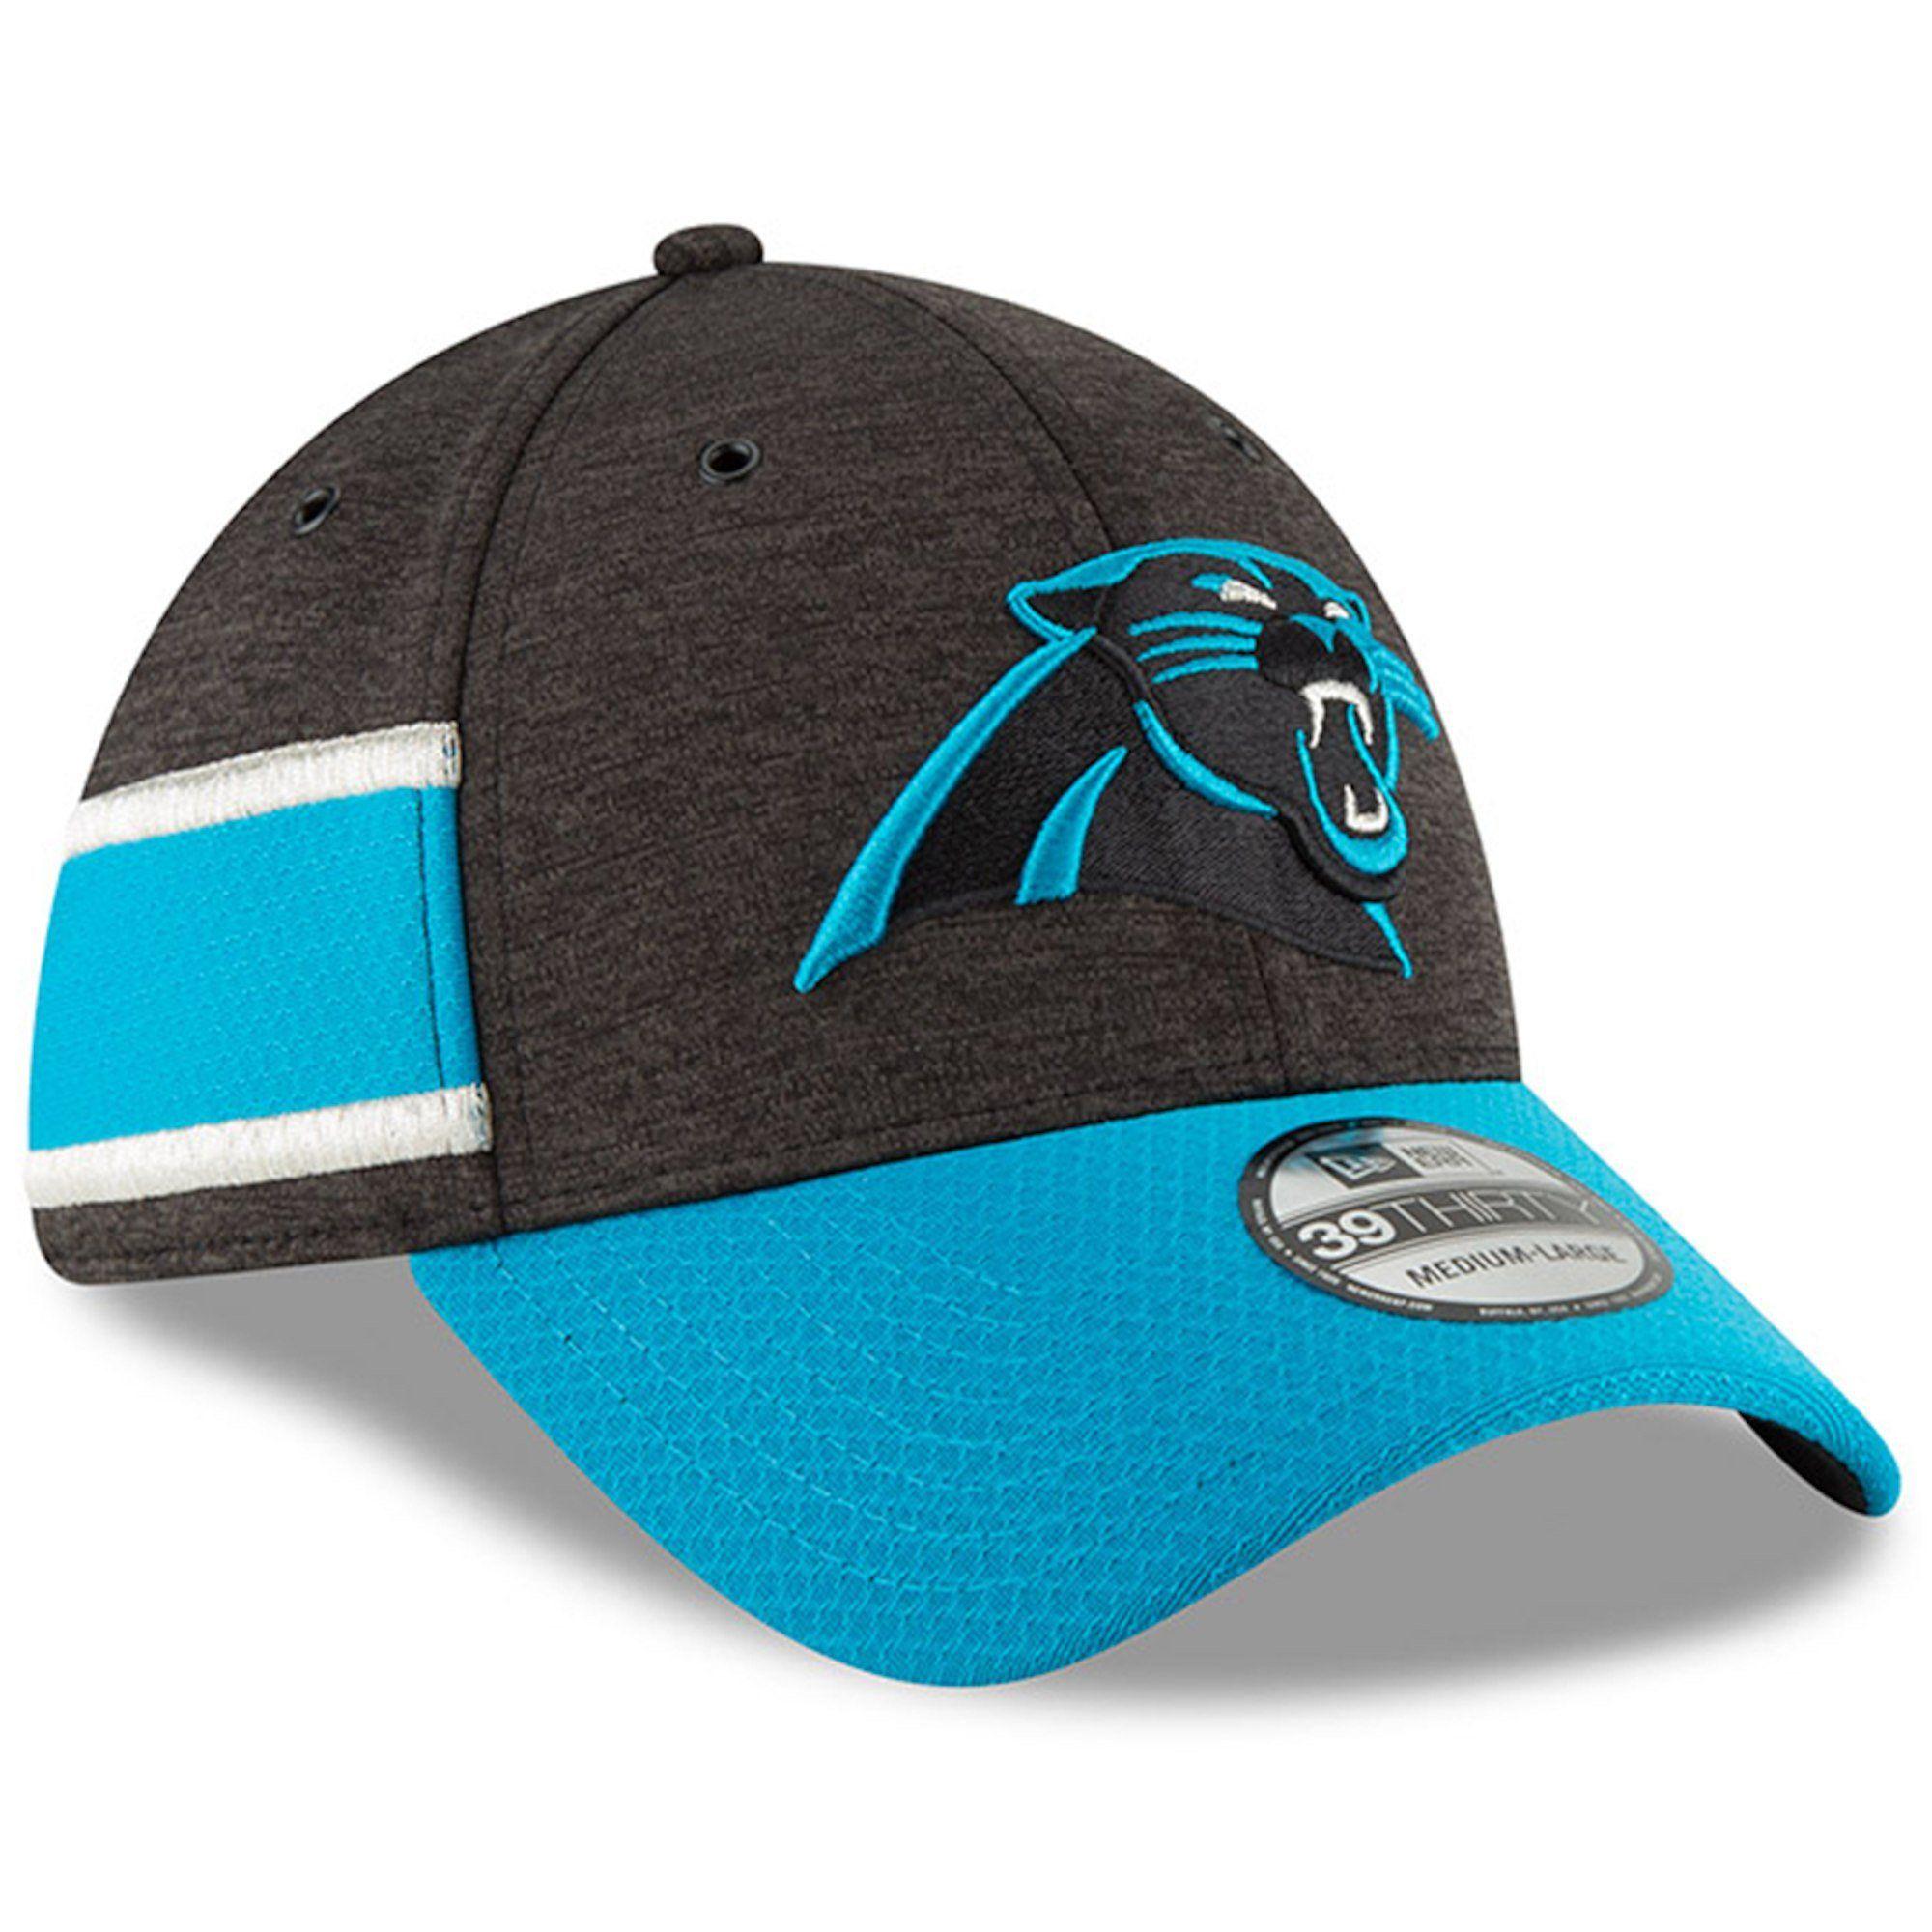 Men s Carolina Panthers New Era Black Blue NFL18 Sideline Home Official  39THIRTY Flex Hat 170721b52